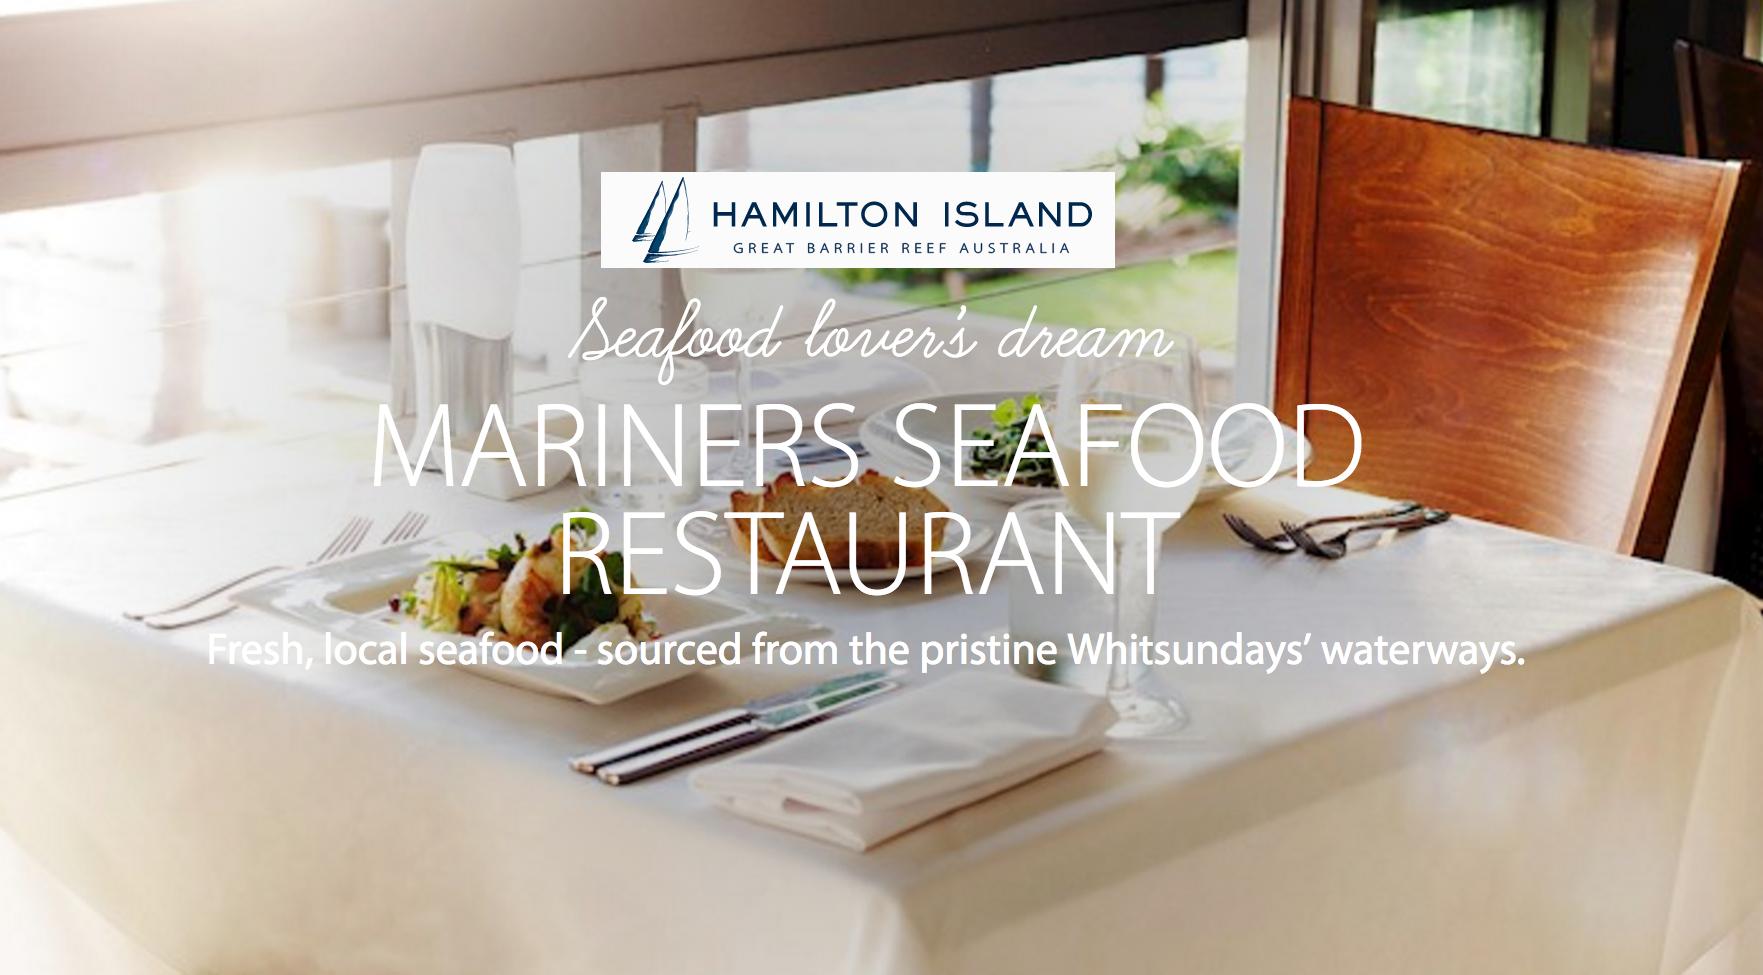 MARINERS SEAFOOD RESTAURANT, HAMILTON ISLAND